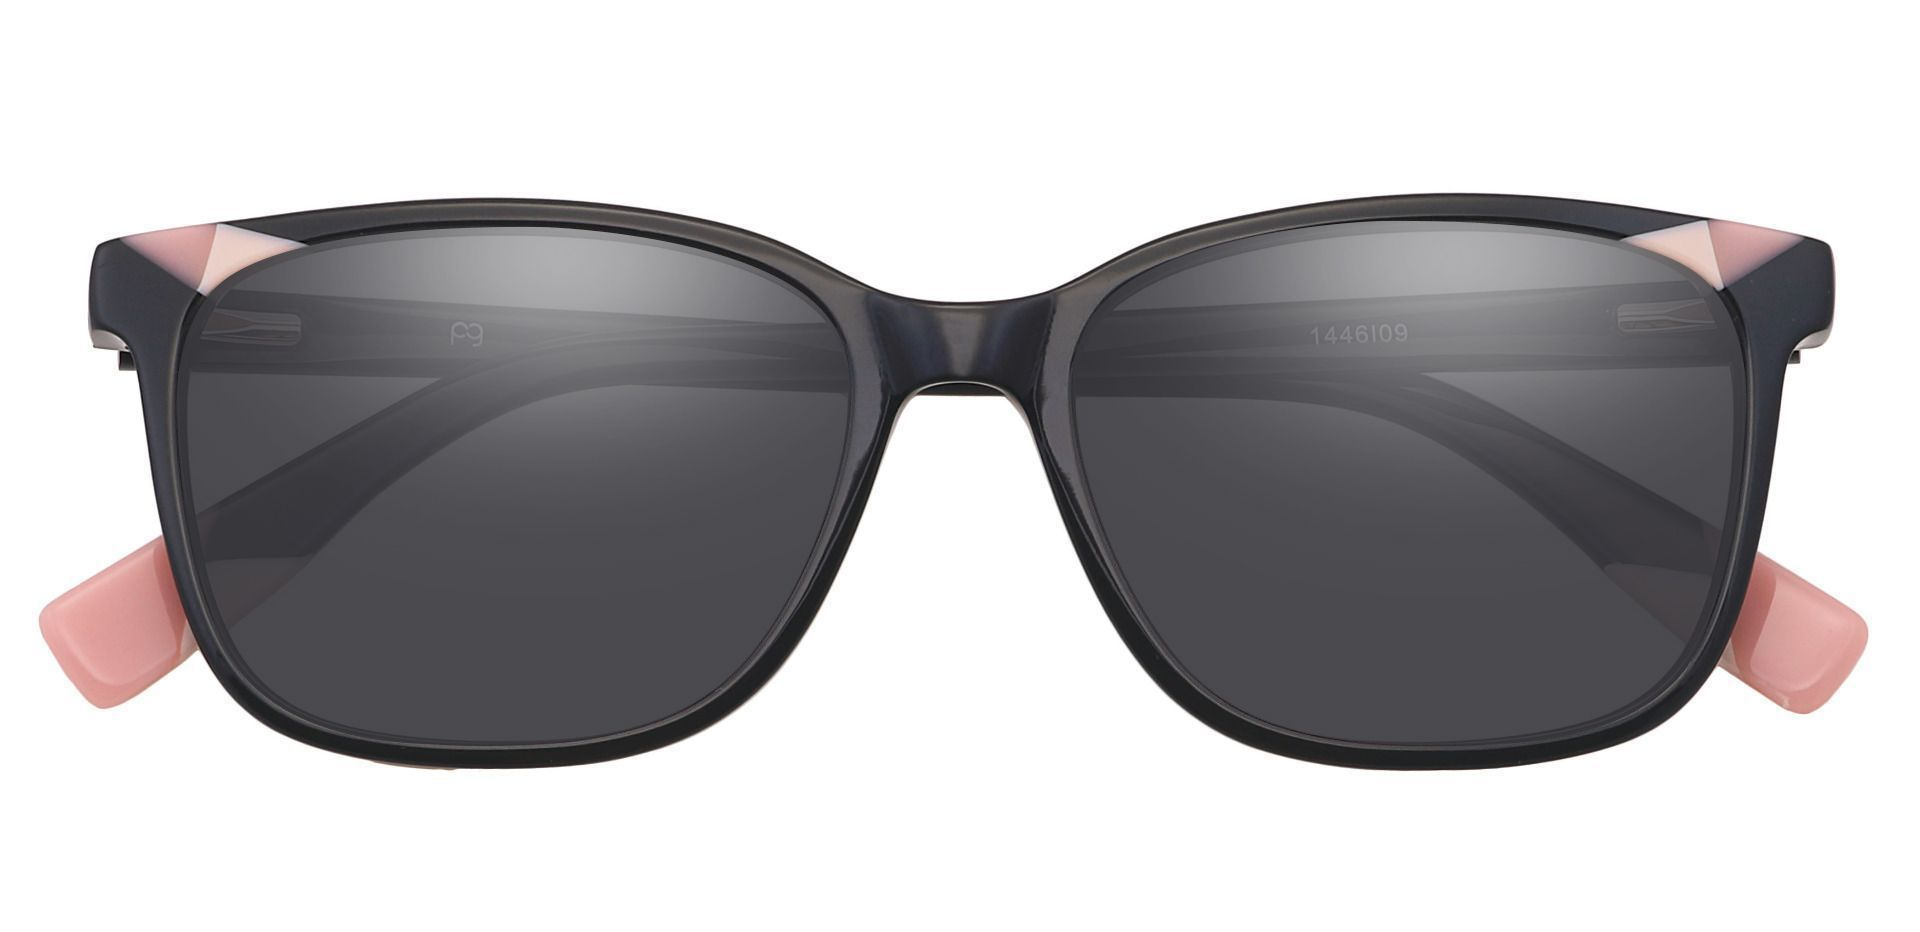 Odessa Square Prescription Sunglasses -  Pink Frame With Gray Lenses